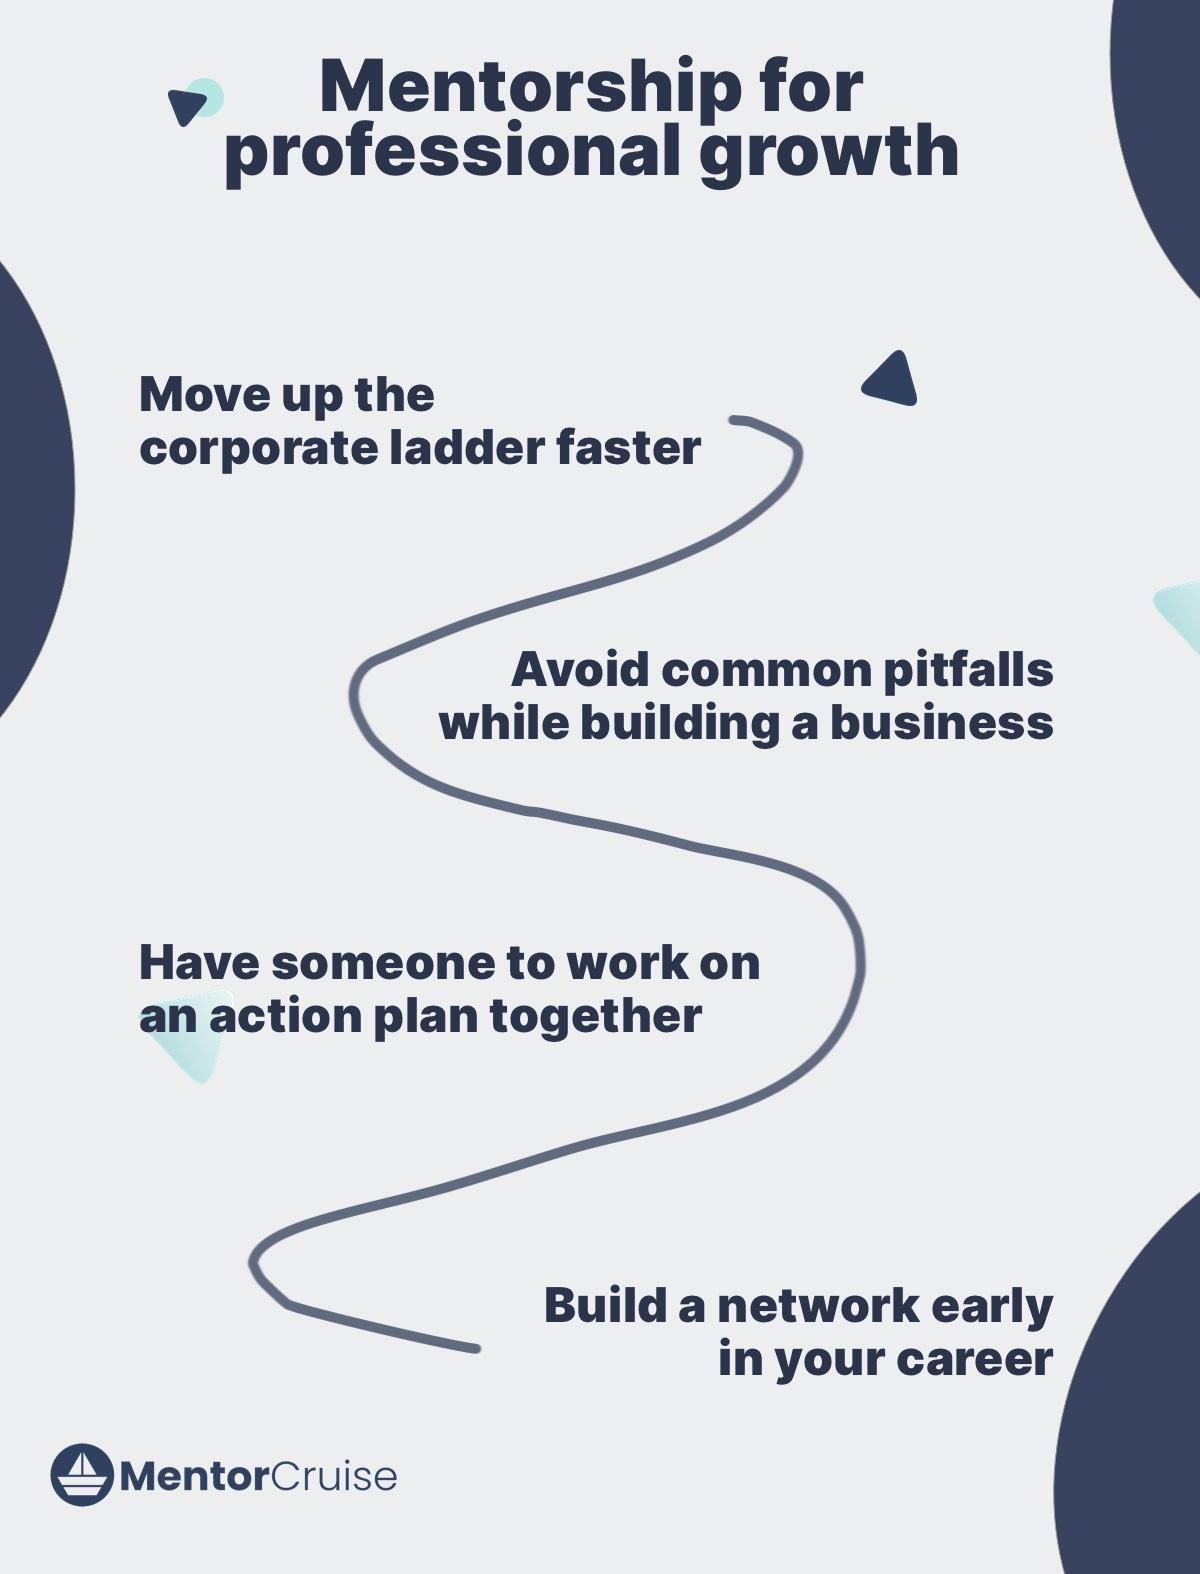 importance of mentorship